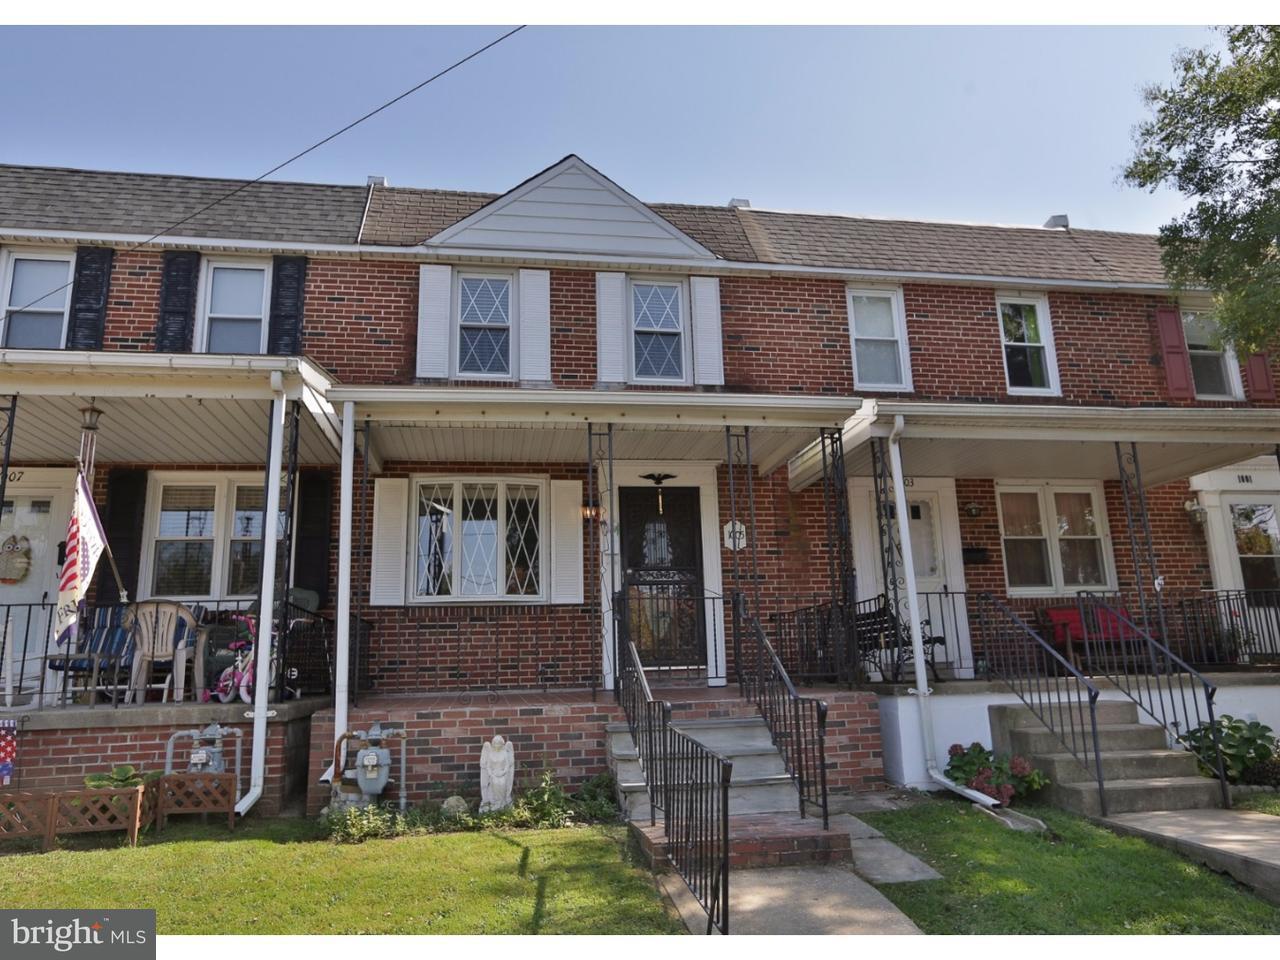 Single Family Home for Sale at 1005 MAPLE Street Conshohocken, Pennsylvania 19428 United States